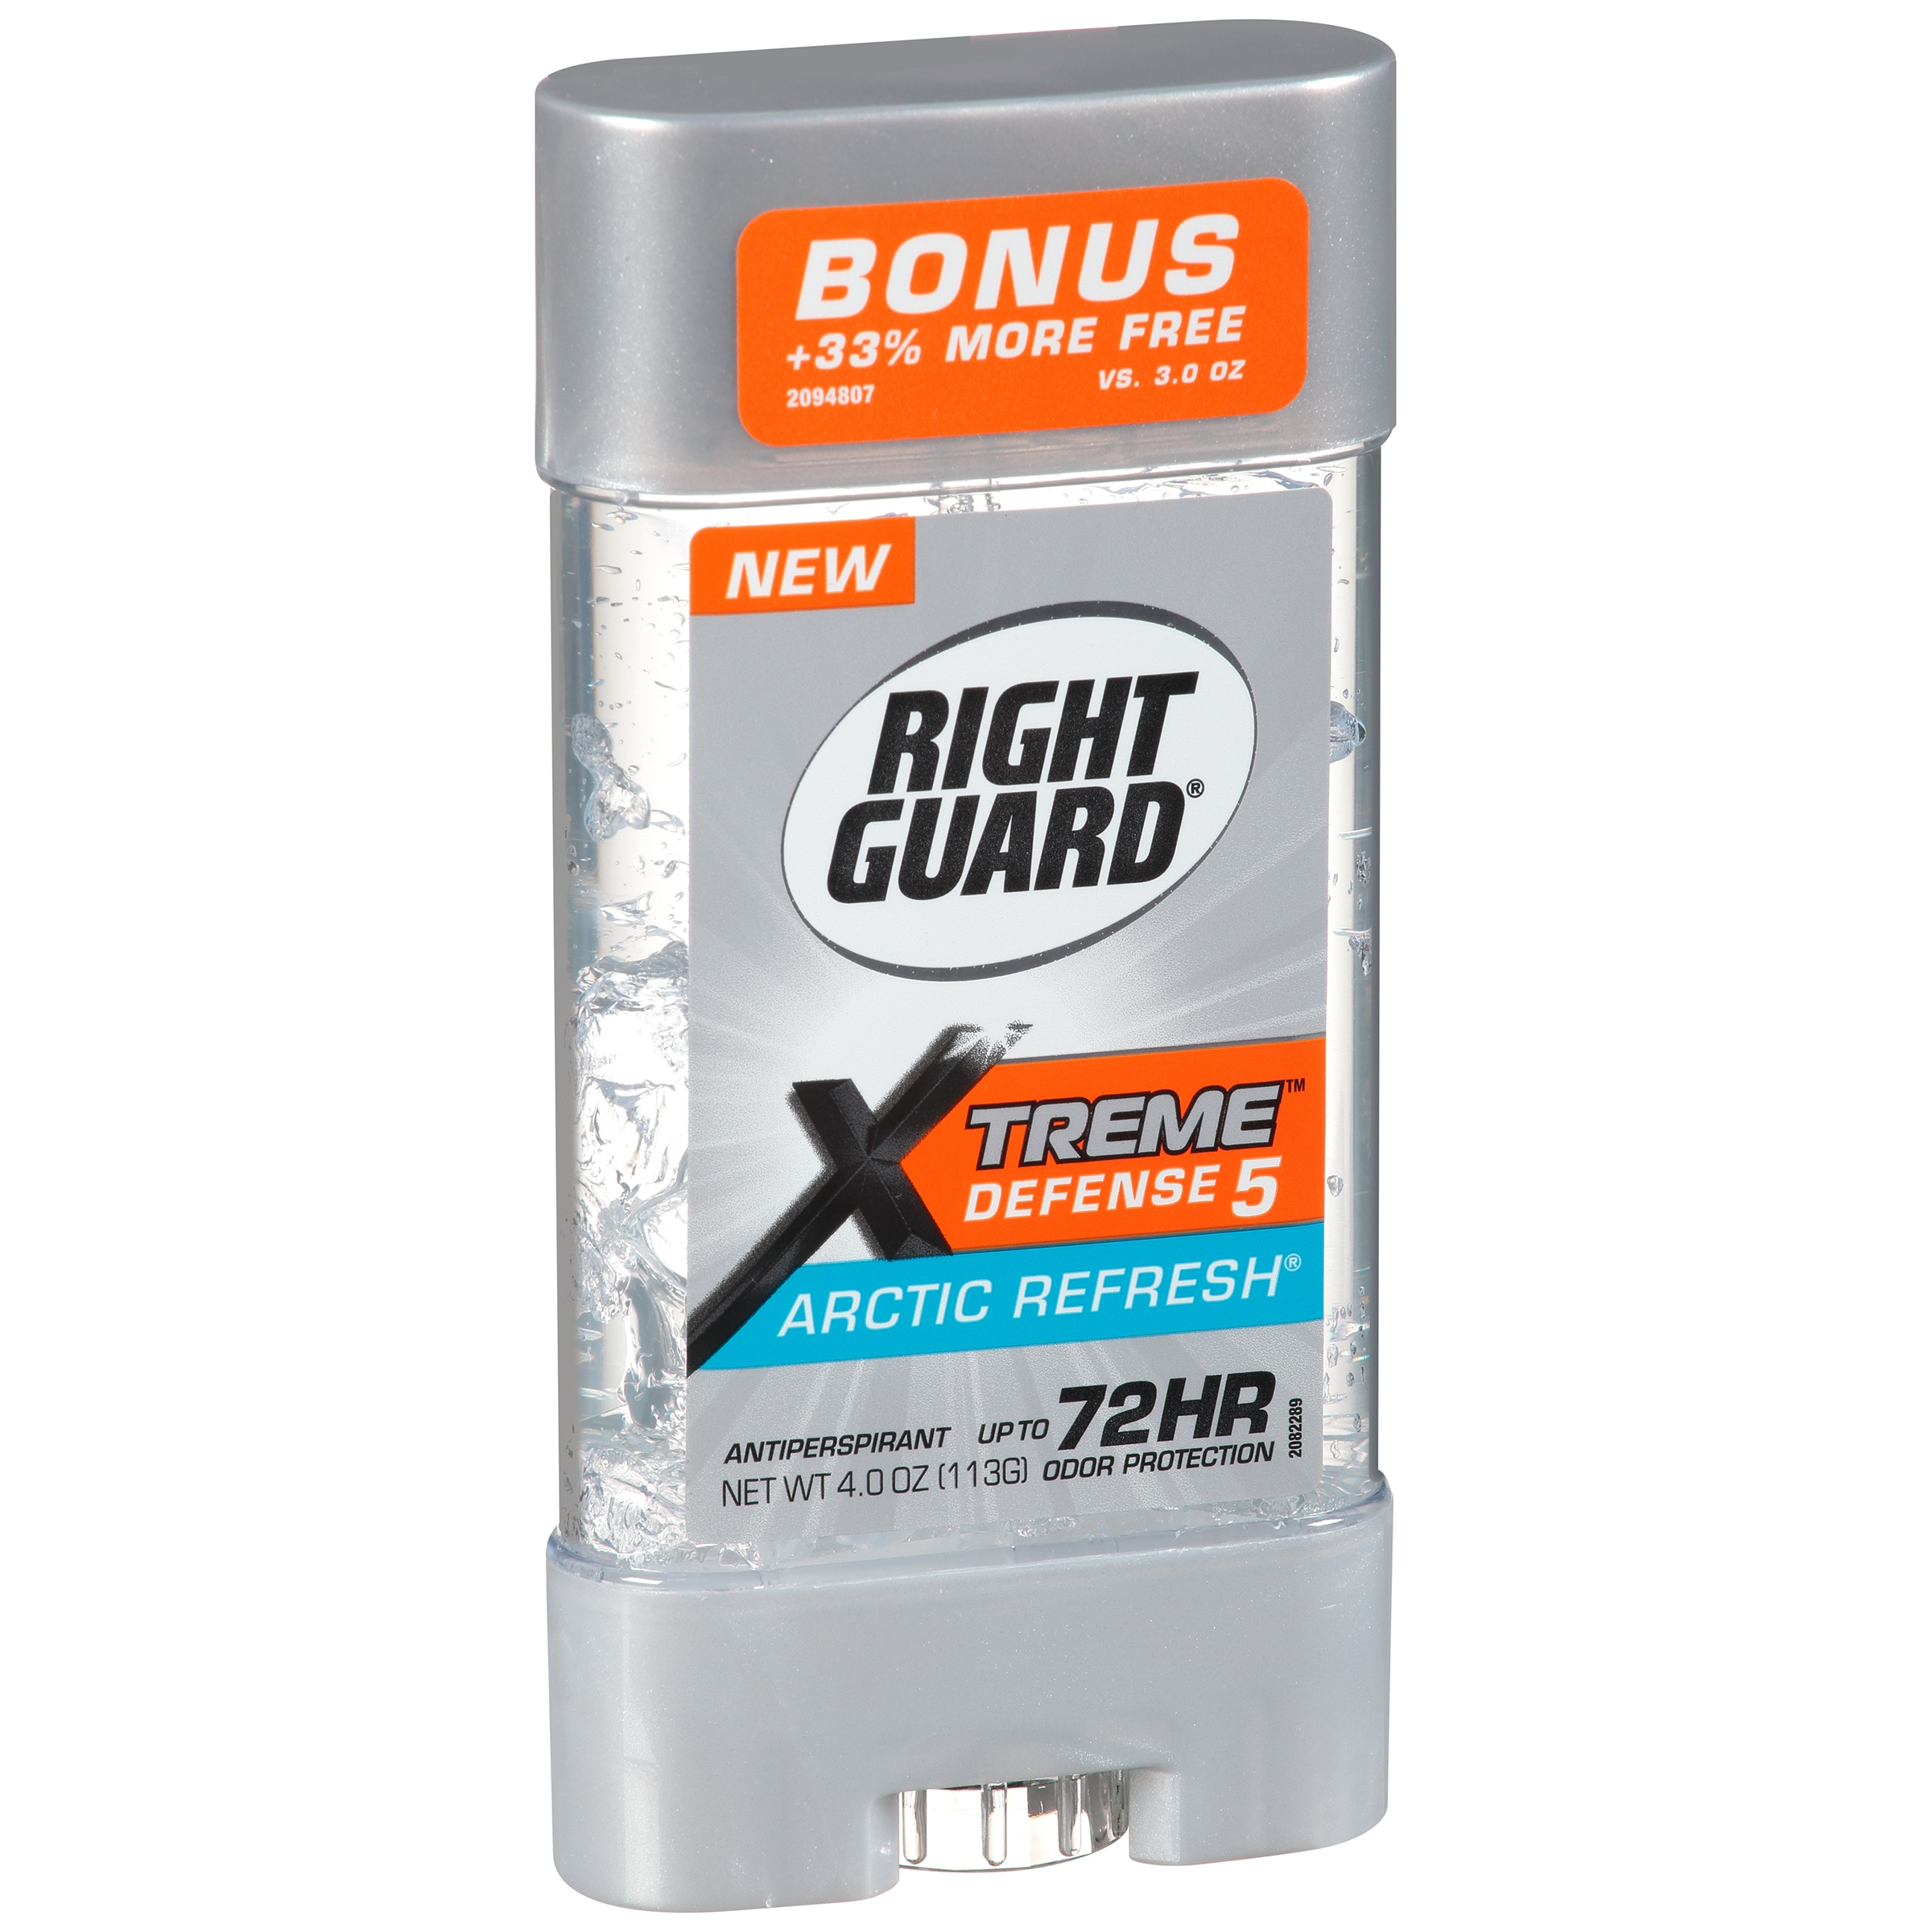 Right Guard Xtreme Defense 5 Antiperspirant Deodorant Gel, Arctic Refresh, 4 Ounce